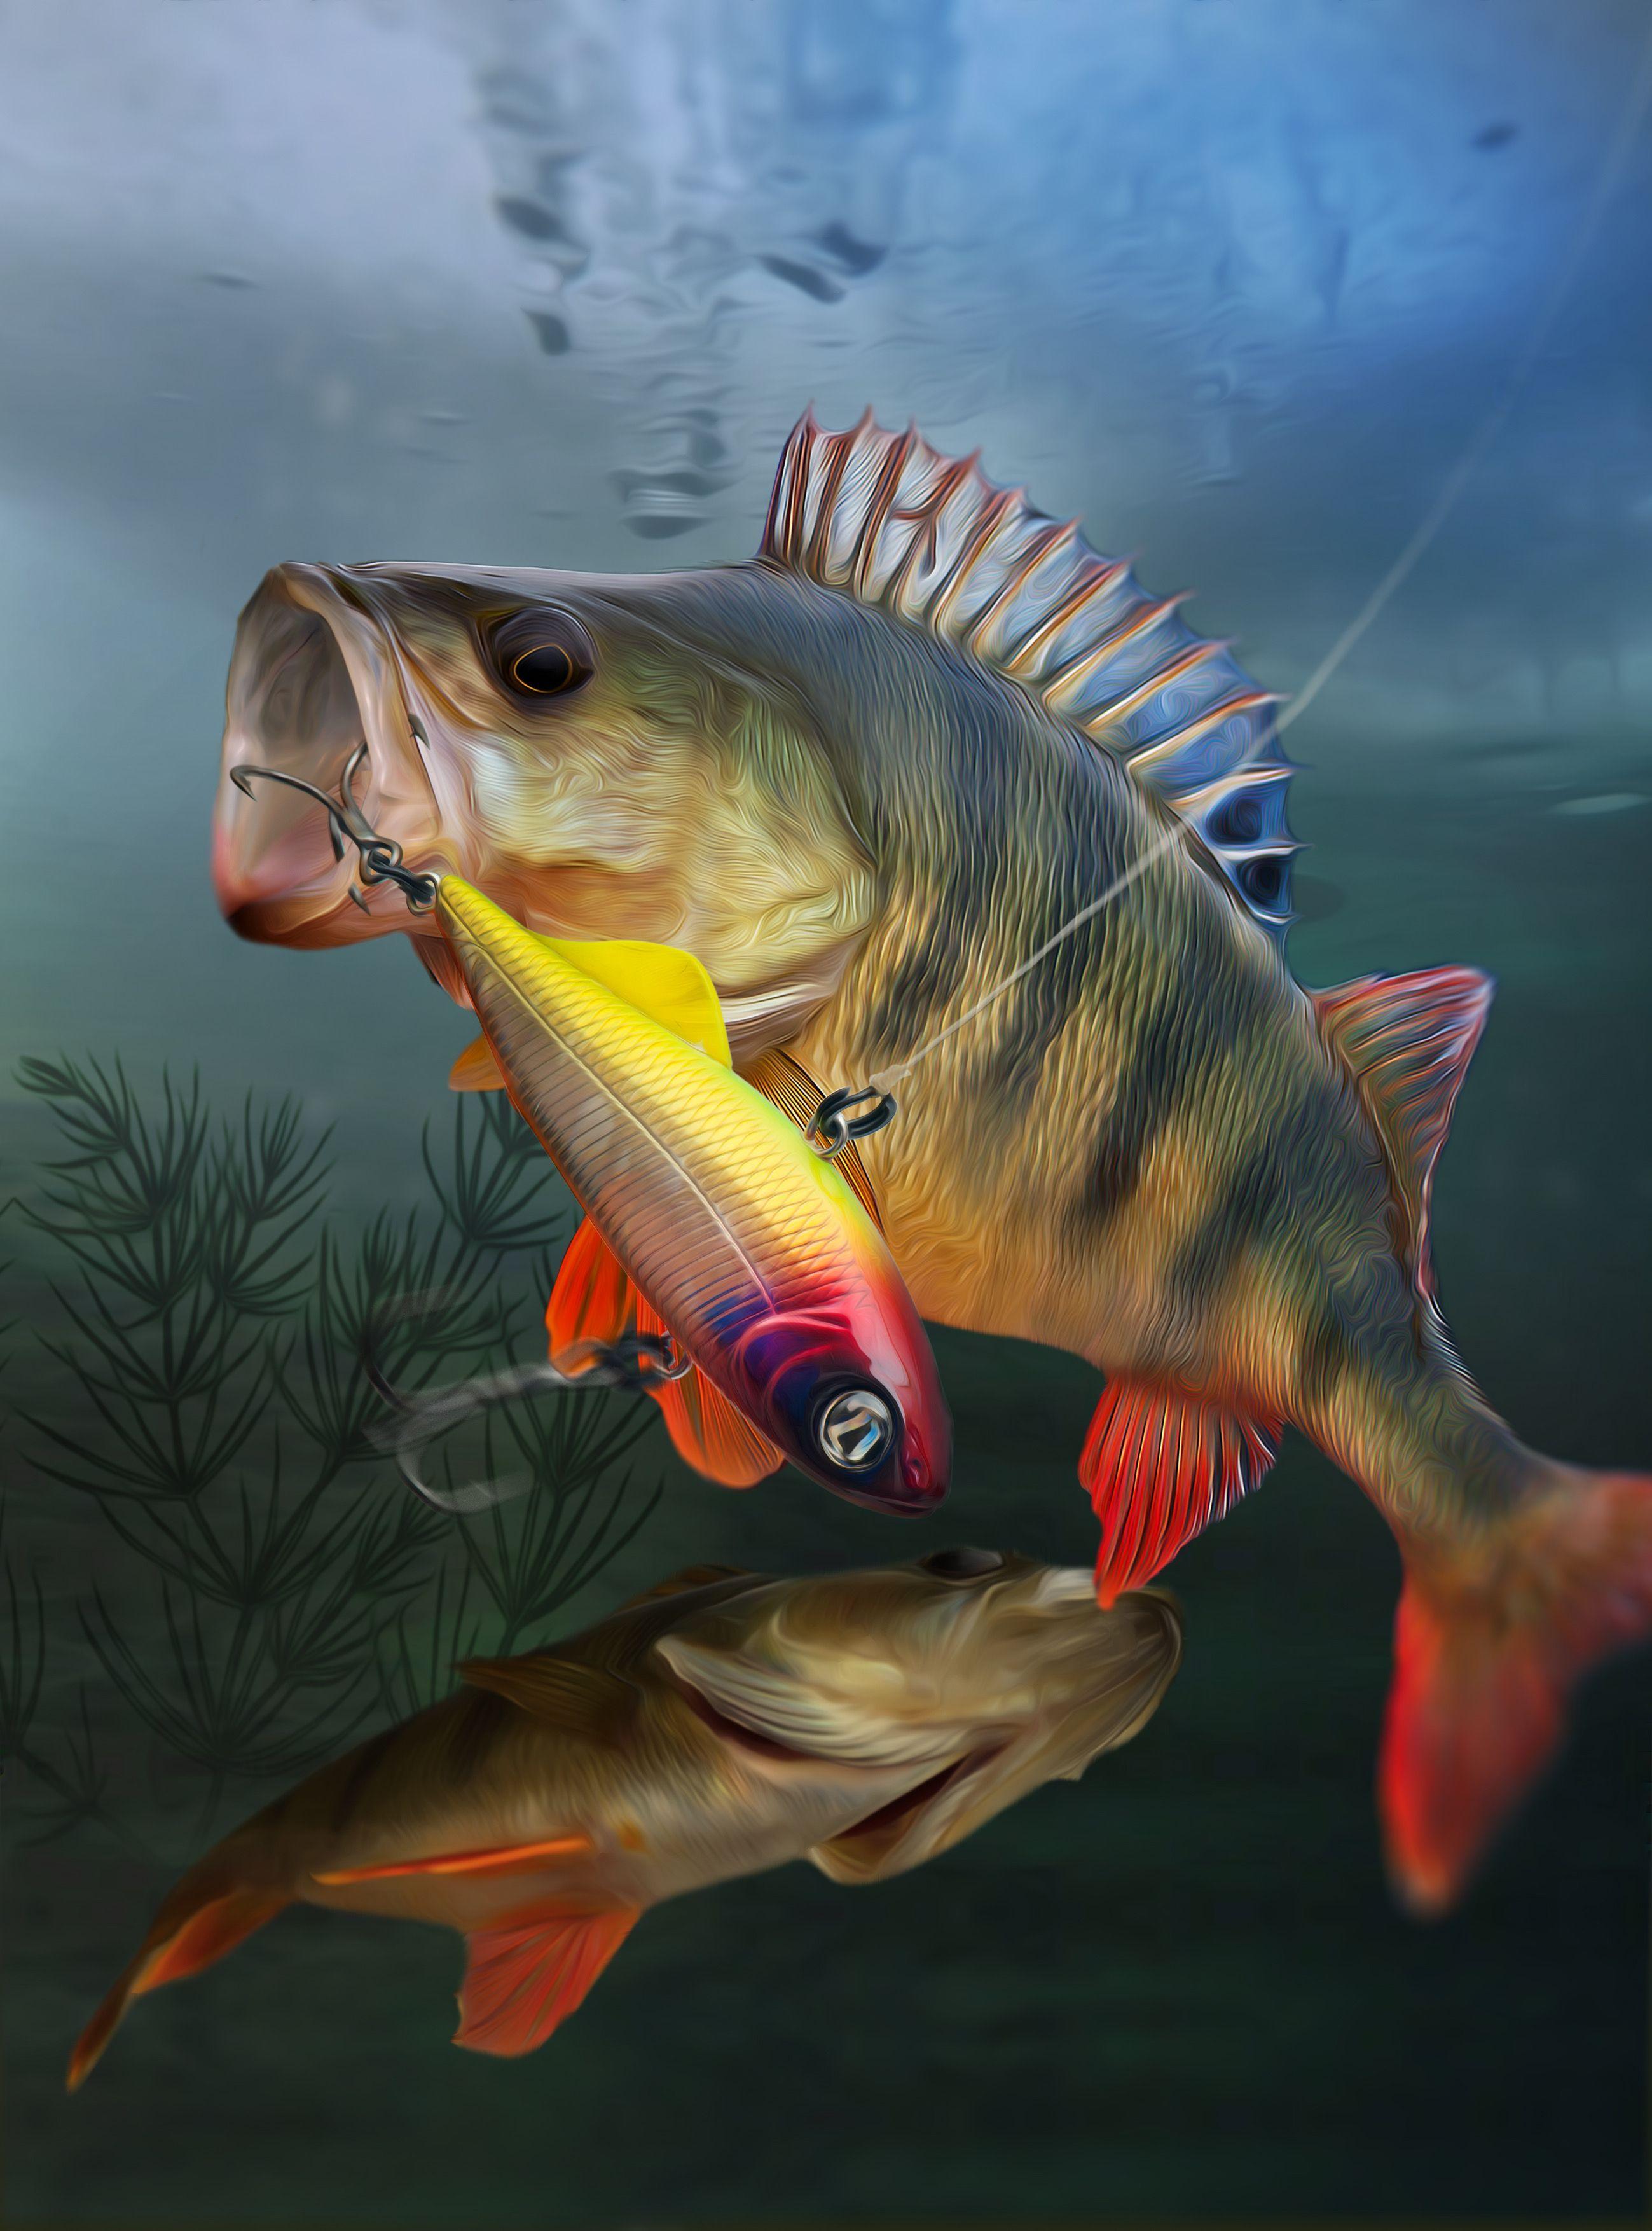 Pin By Ismo Riihikallio On Fresh Water Fish Photos In 2021 Fish Wallpaper Fish Art Fish Artwork